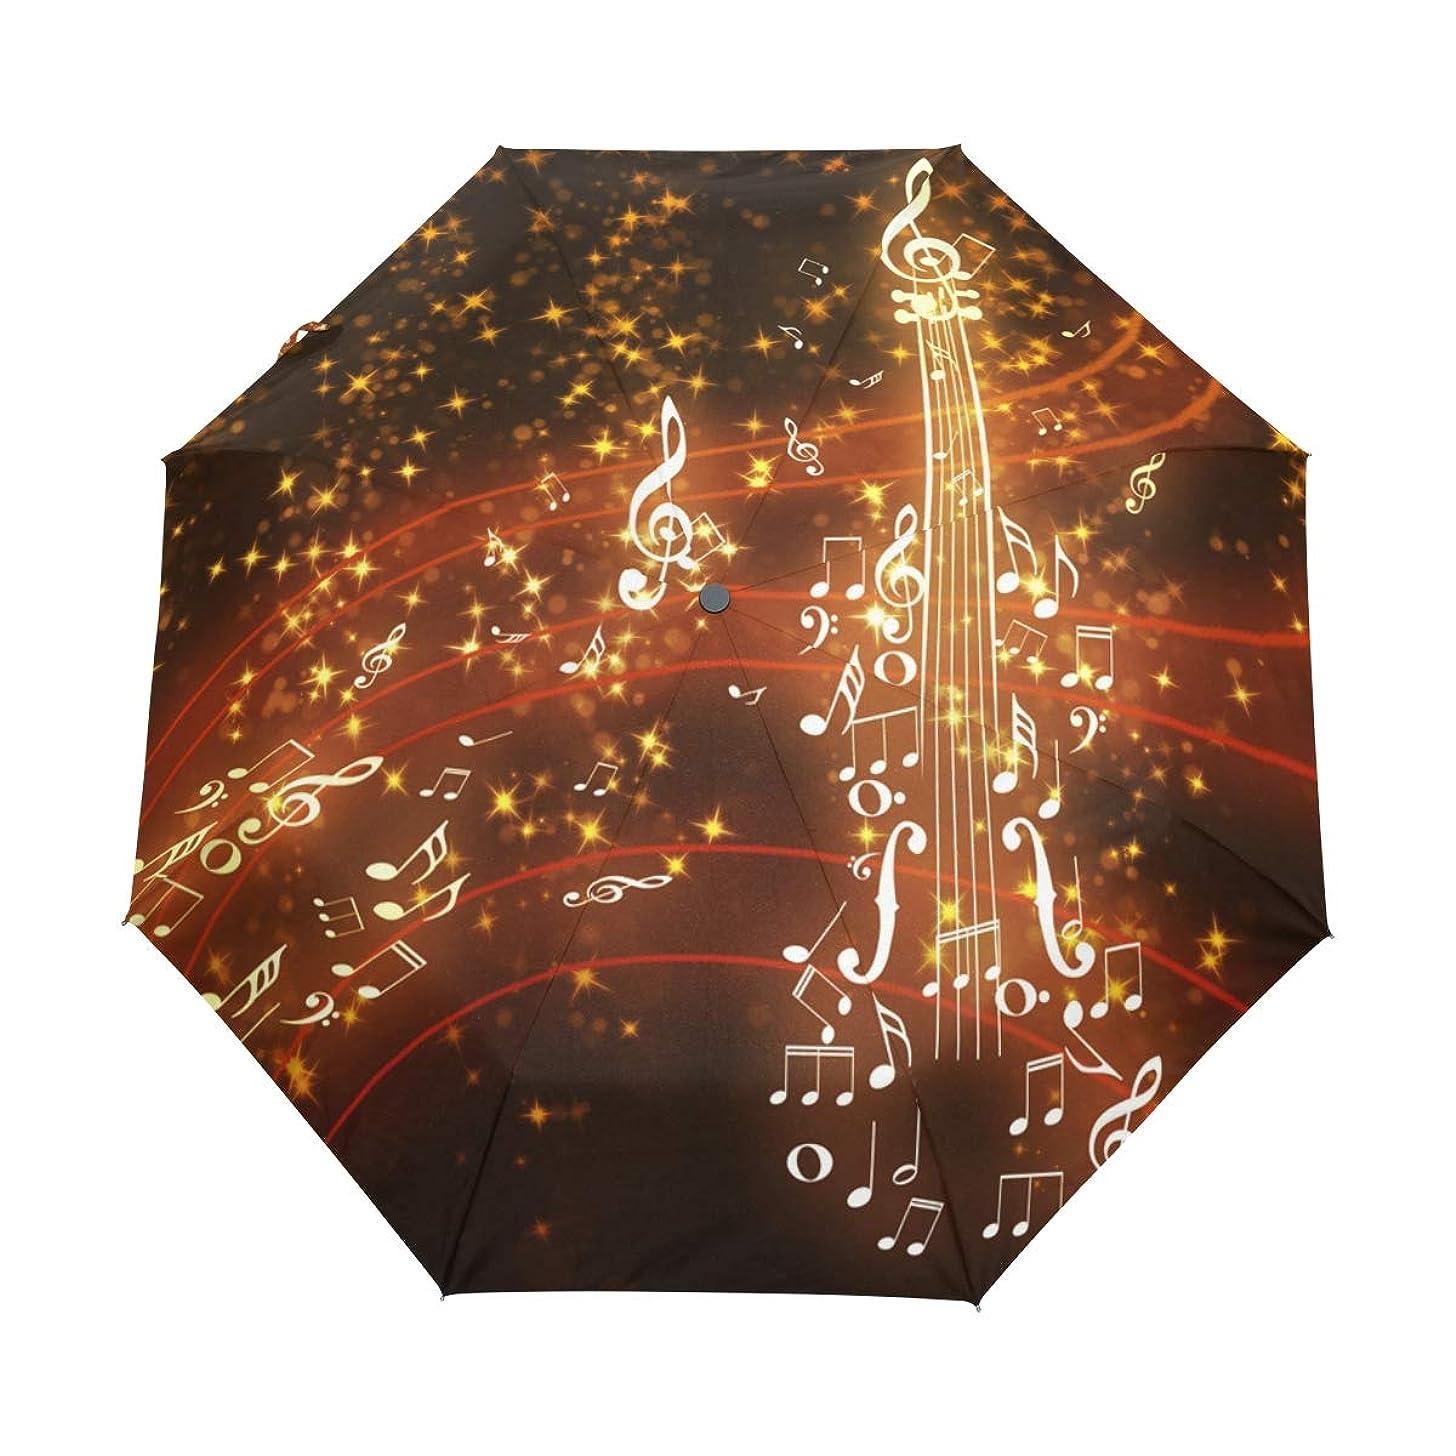 Automatic Umbrella Music Note Violin Windproof Compact Folding travel Umbrellas